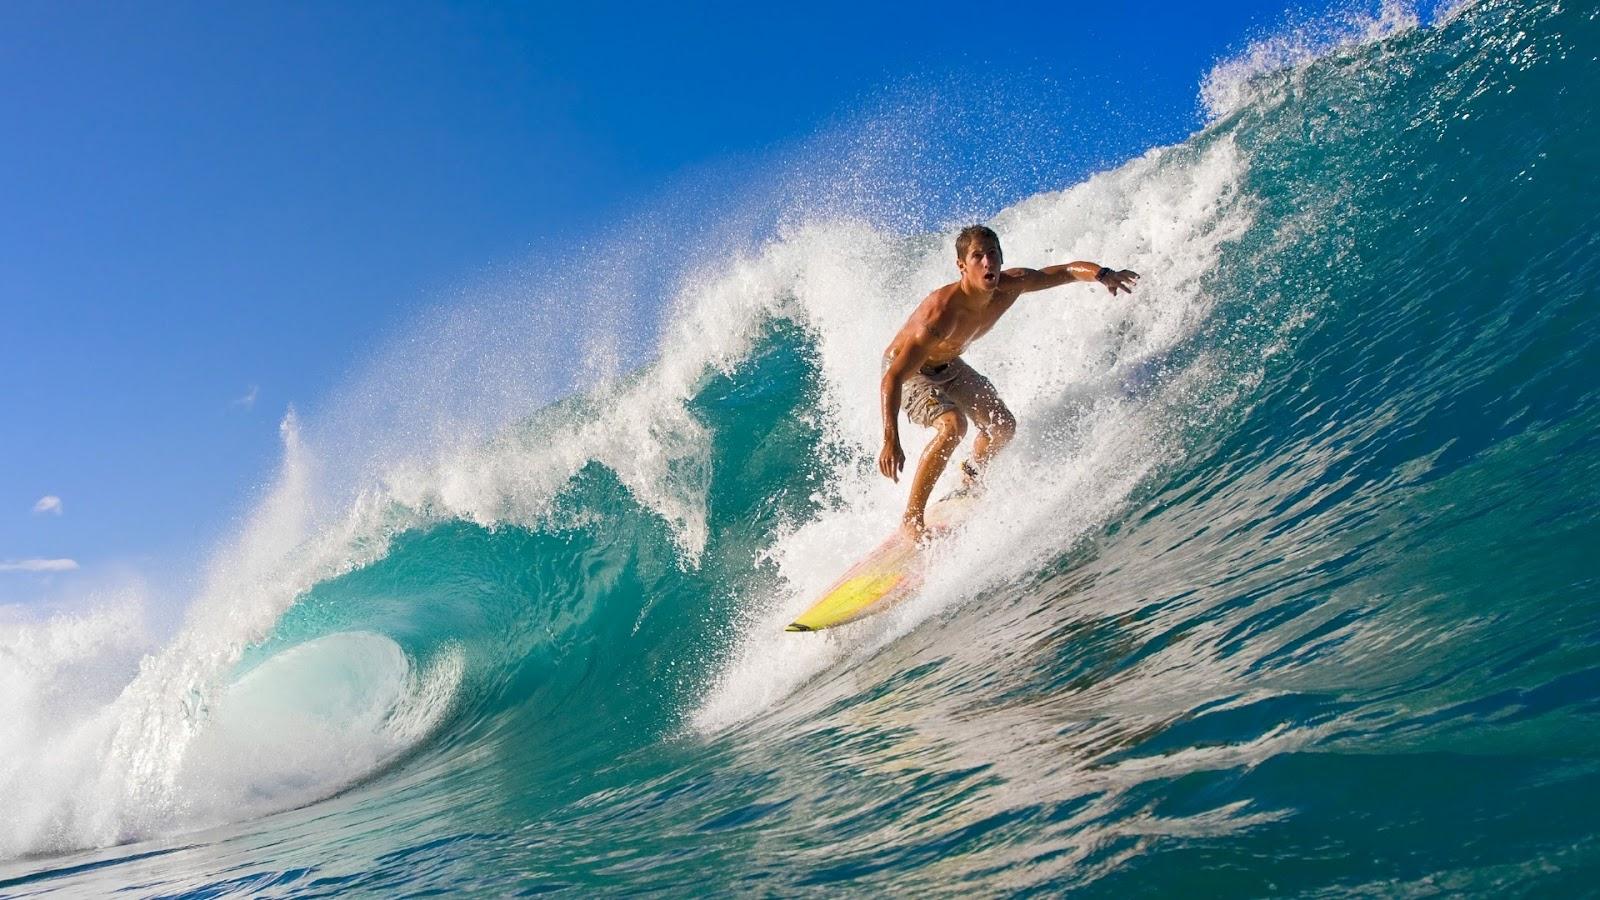 http://3.bp.blogspot.com/-Ts9PcyHWzMo/T27xnyD9b1I/AAAAAAAAC00/Qwa2ZBVMKJQ/s1600/Great+Wave+For+Surfing+Wallpaper+5.jpg